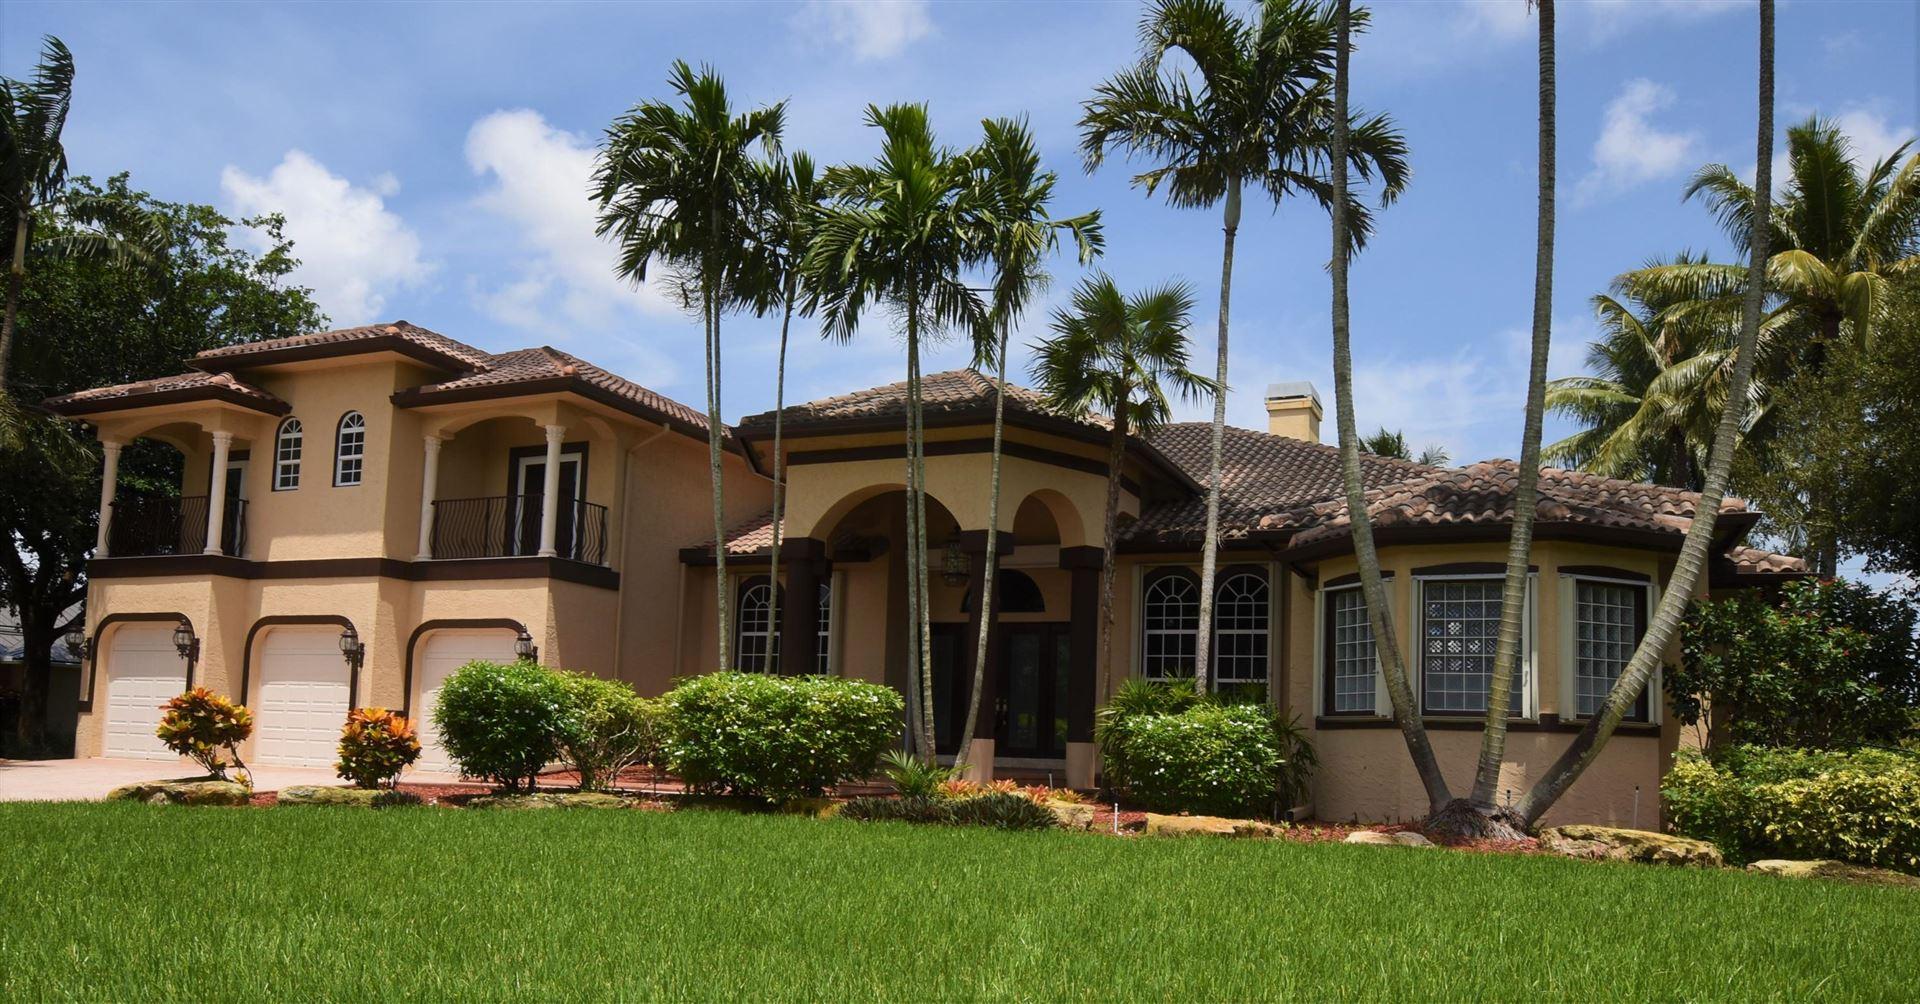 11251 NW 14 Street, Plantation, FL 33323 - #: RX-10607350